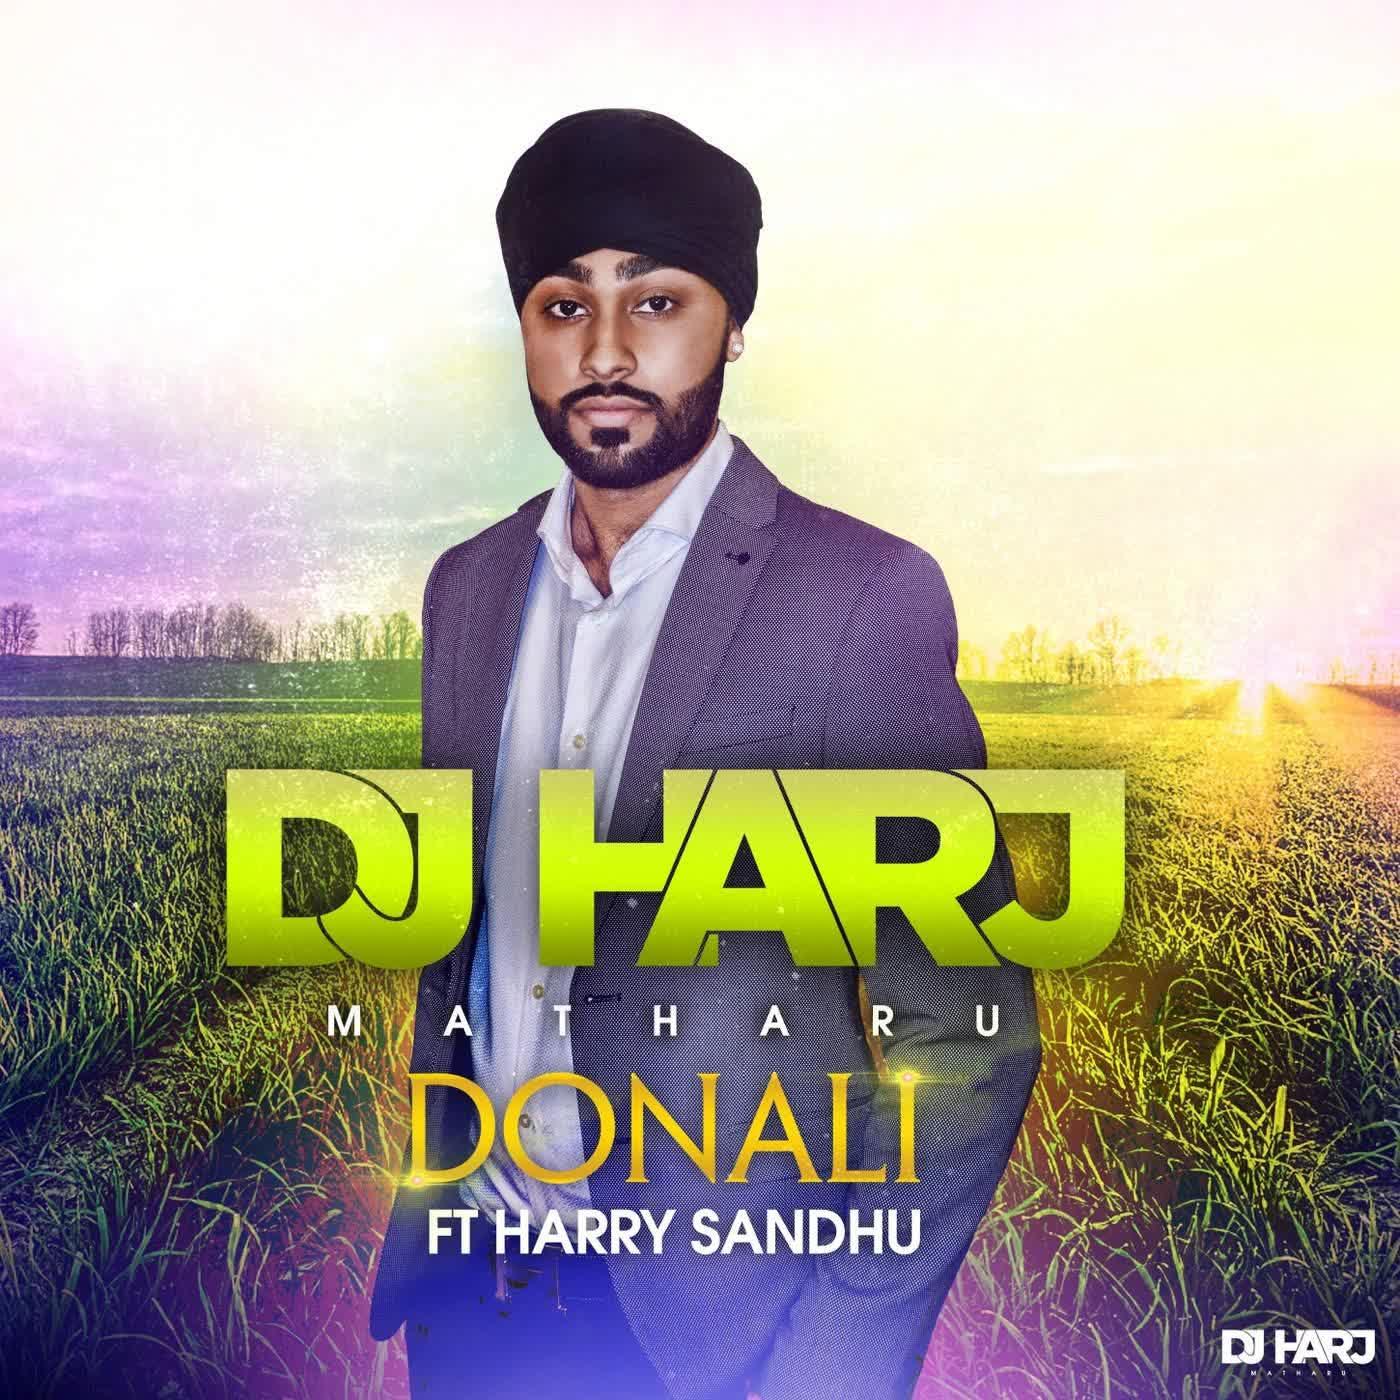 Donali Harry Sandhu Mp3 Song